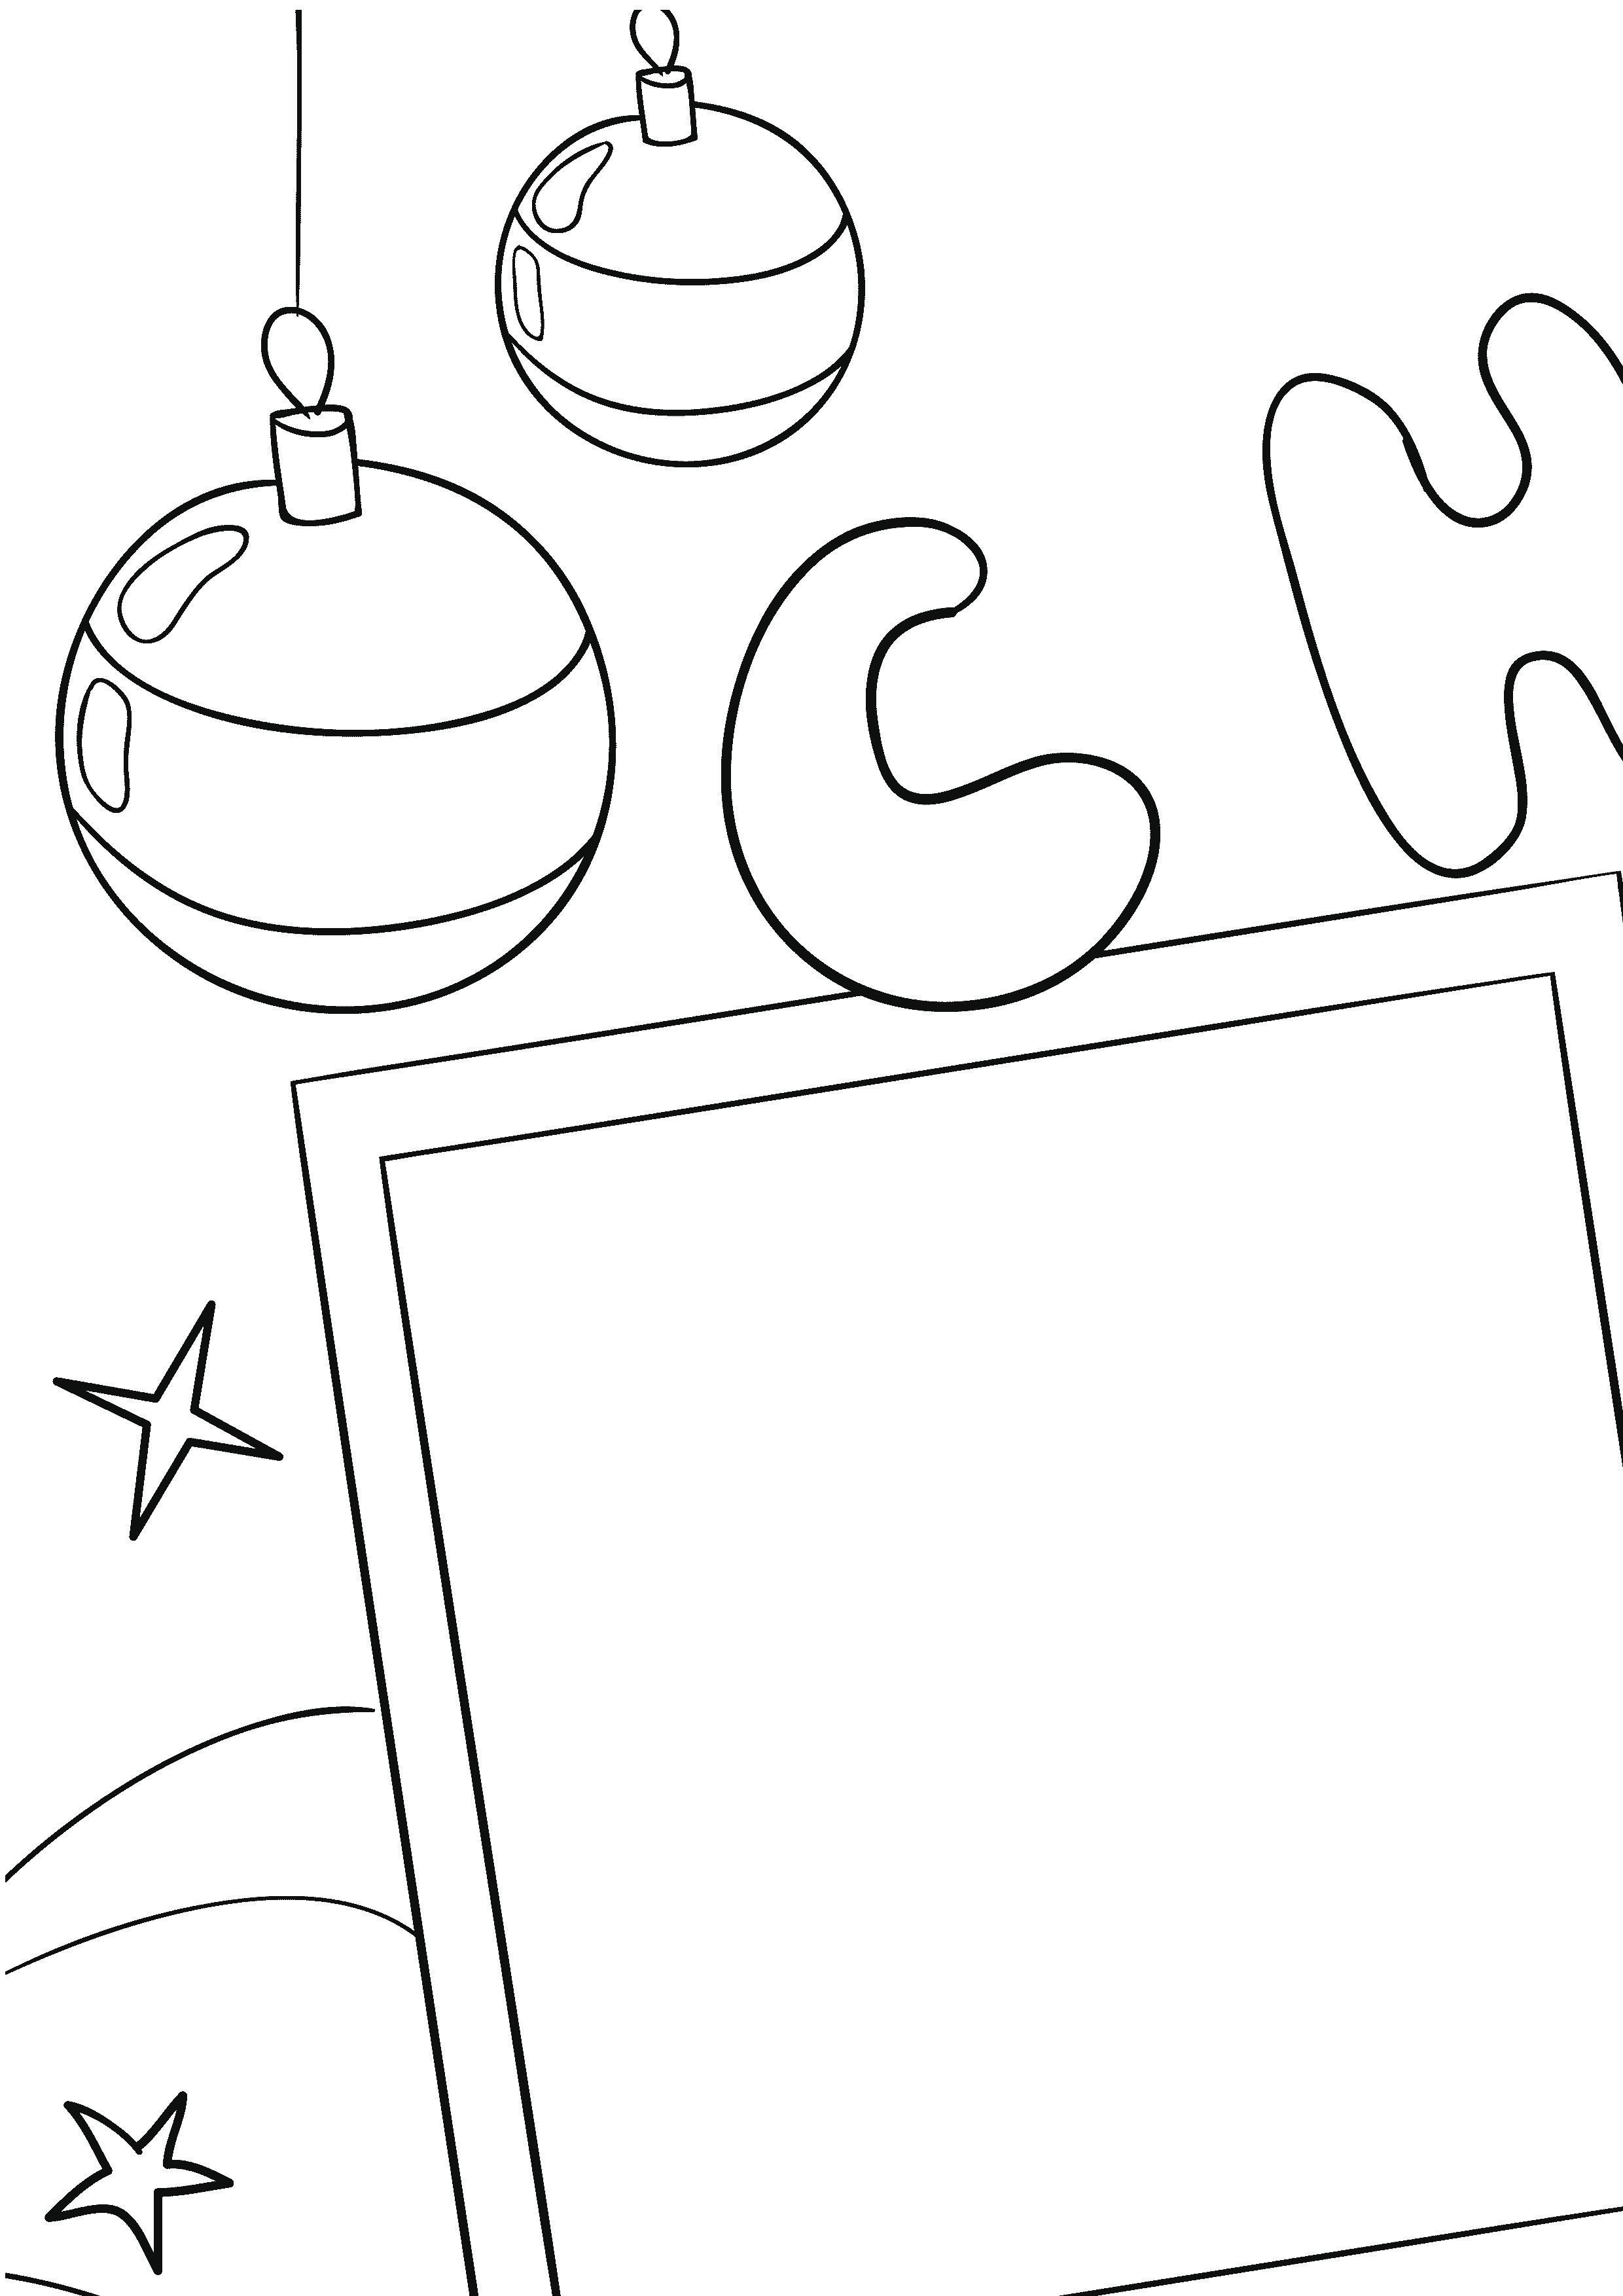 часть-1